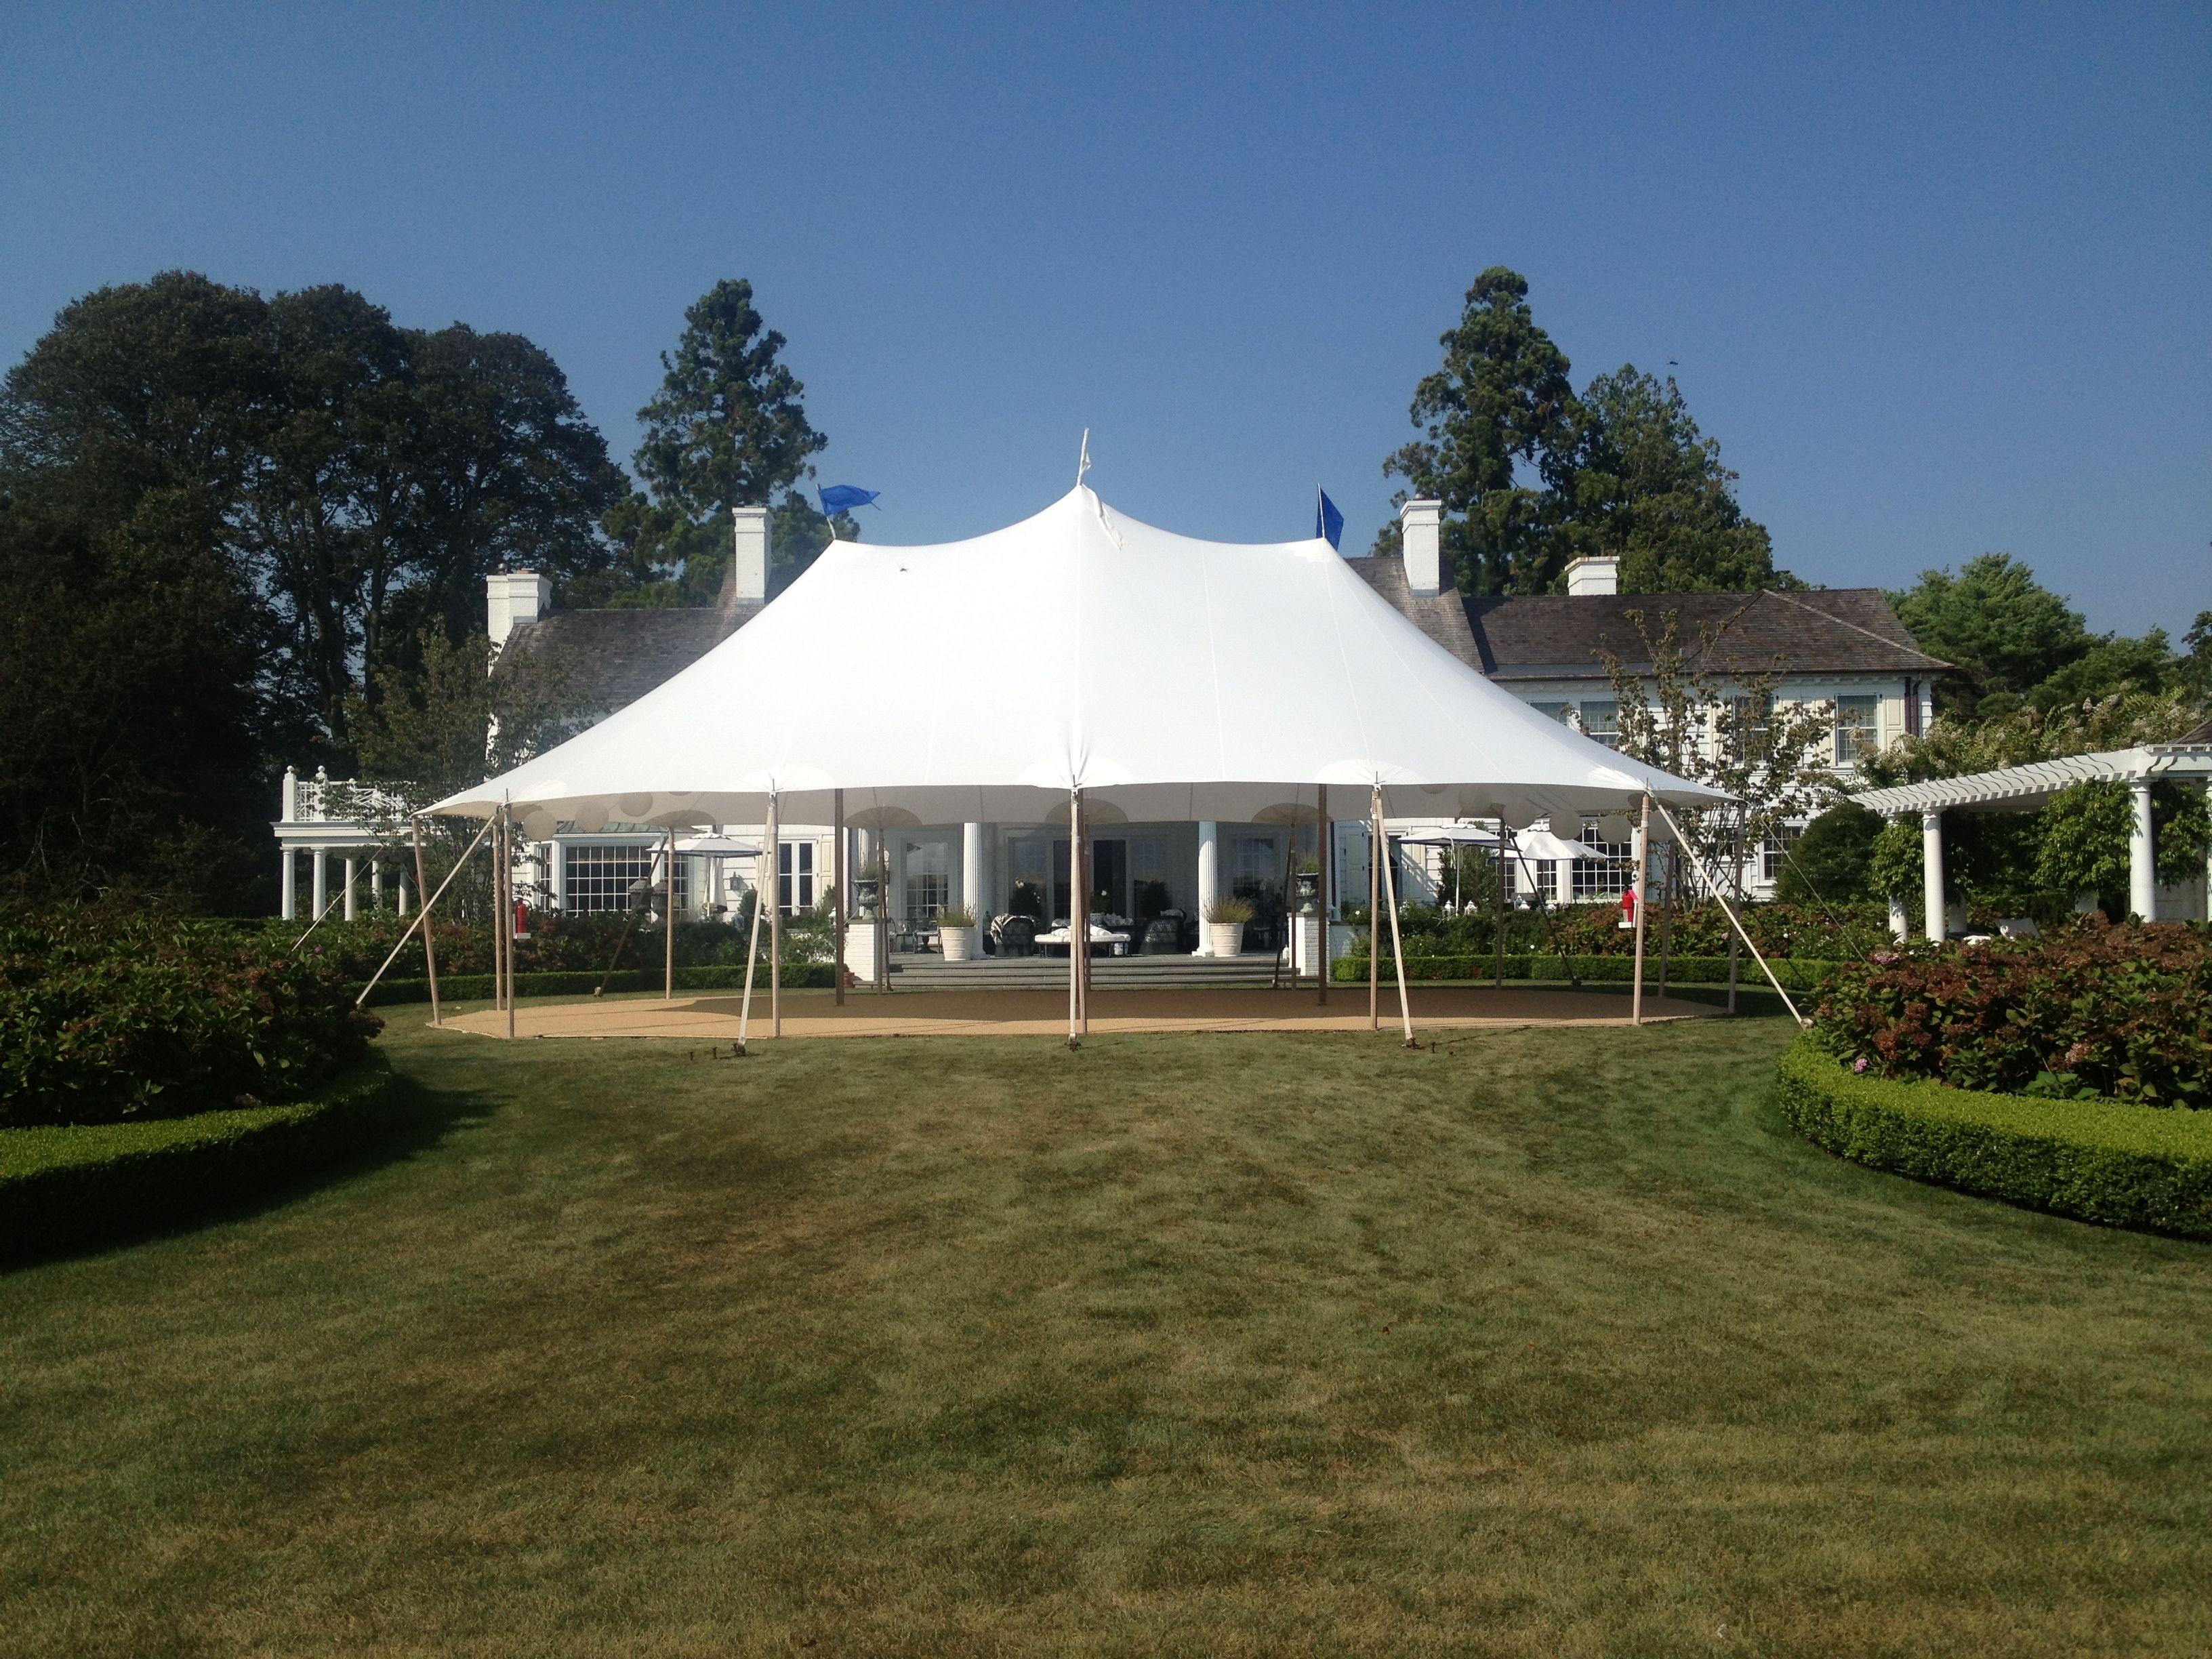 Starr Tent Tidewater-Tent & Starr Tent Tidewater-Tent | Weddings | Pinterest | Tents and Weddings